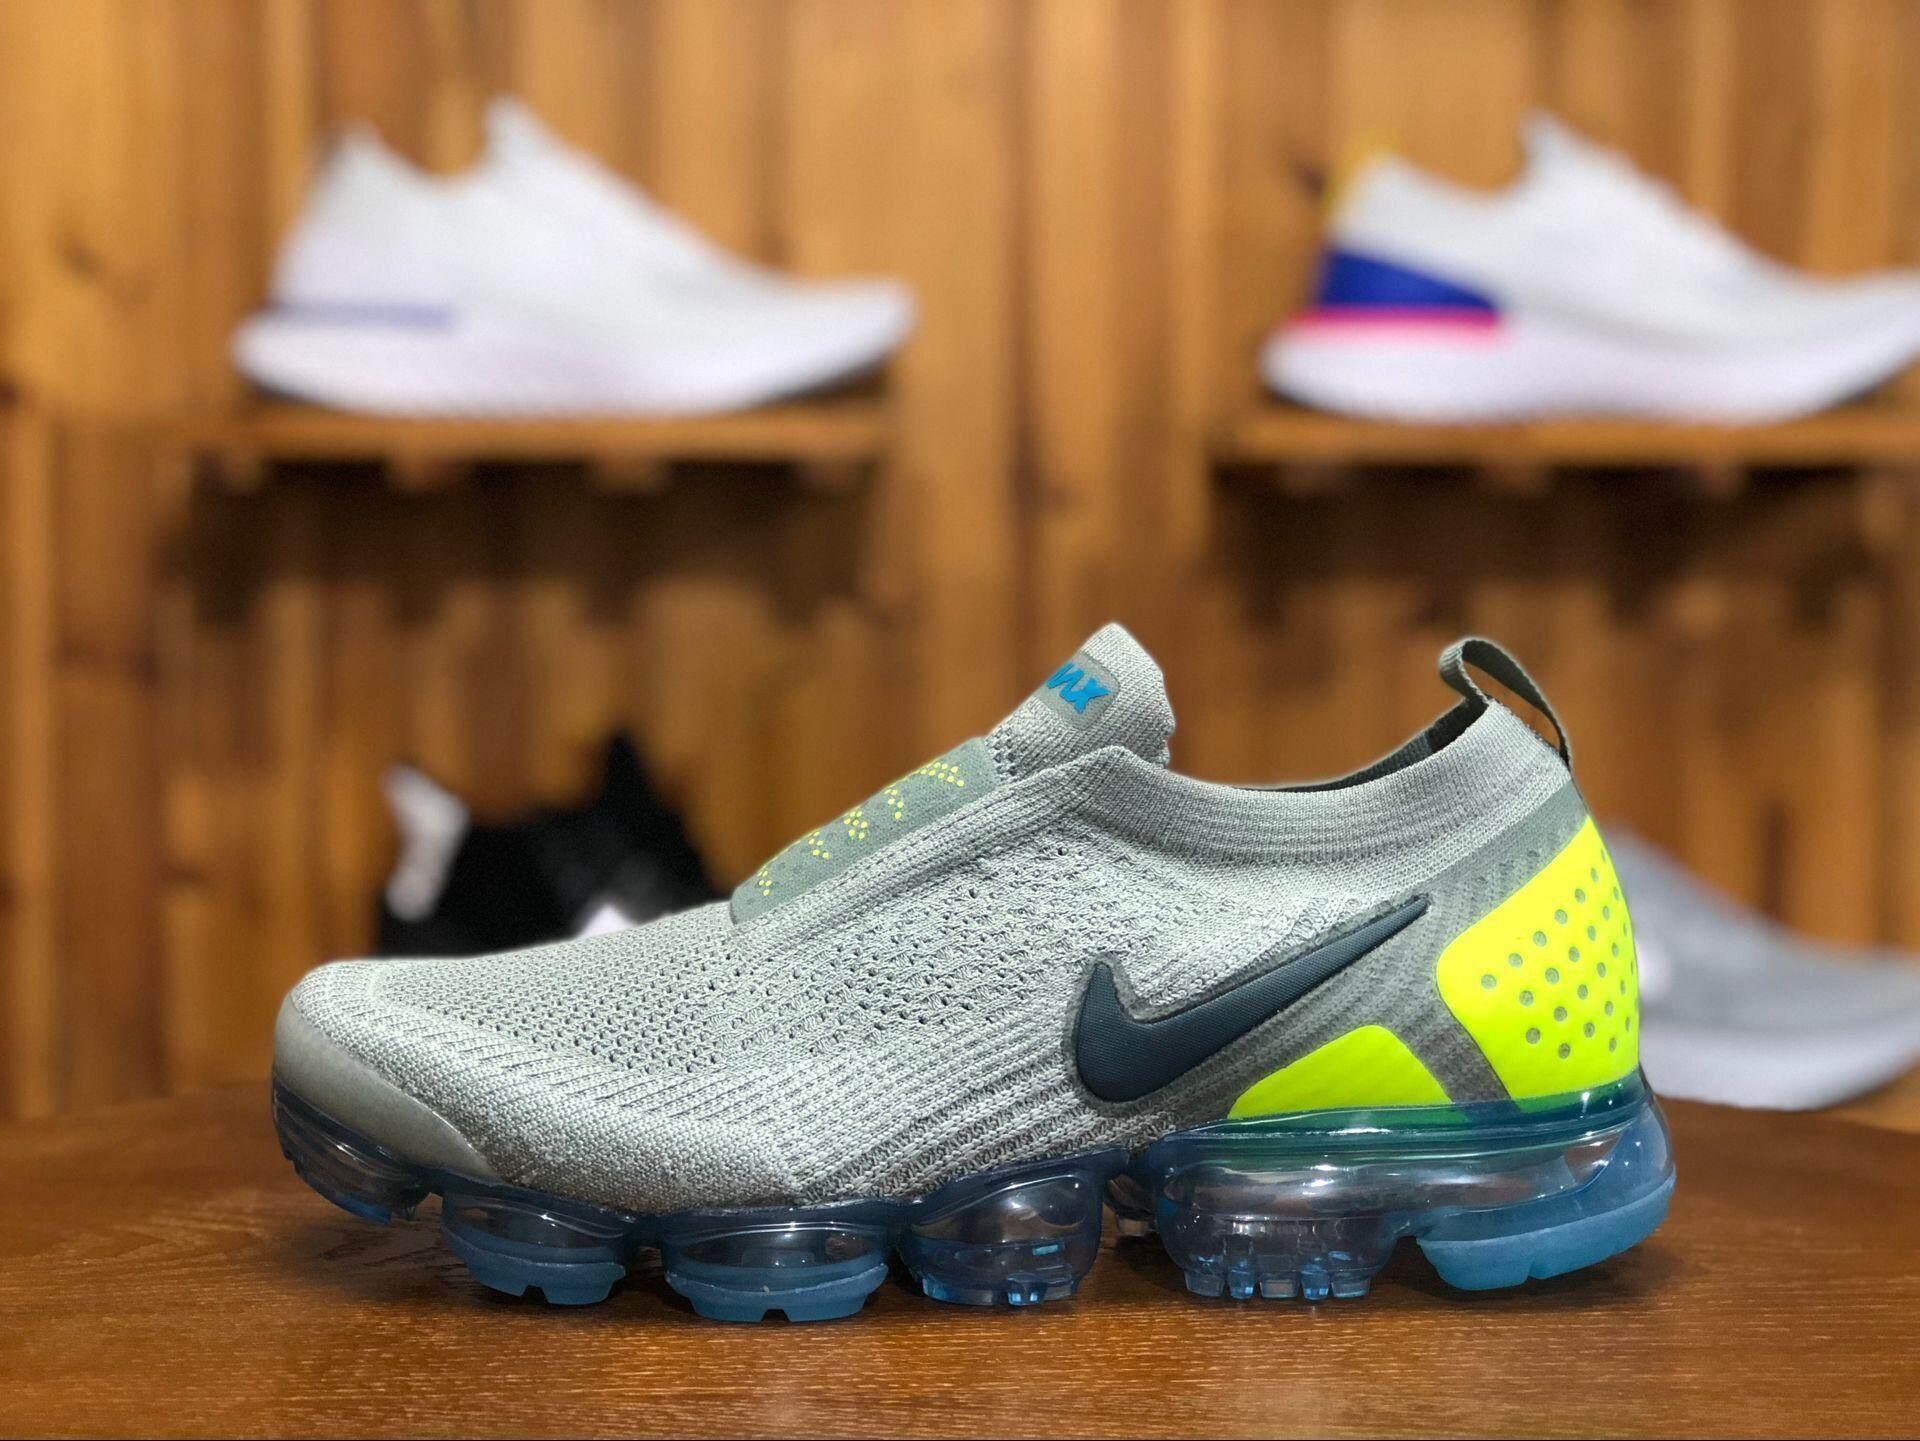 pretty nice c78bc f13e4 Nike AIR VAPORMAX FK MOC 2 Shoes Men's Running Fashion Sneakers